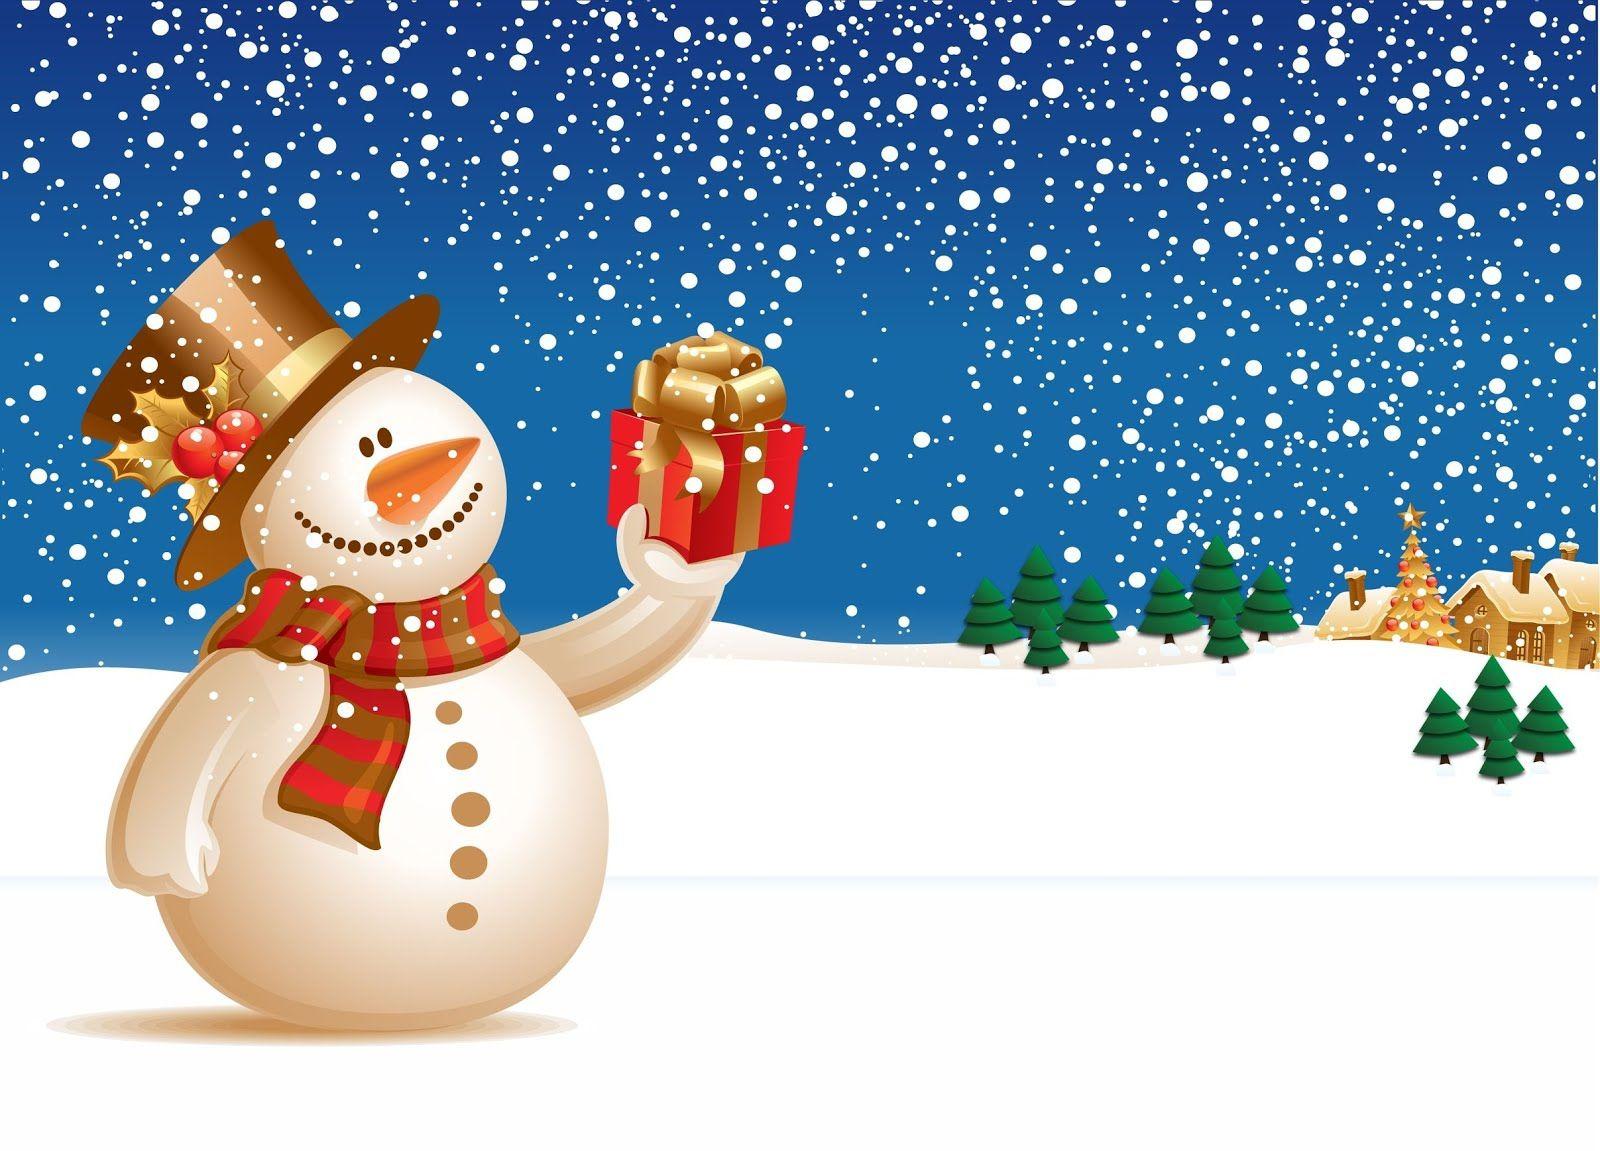 Fondos Navidad Animados: Fondos Navideños Animados Para Fondo De Pantalla En 4K 7